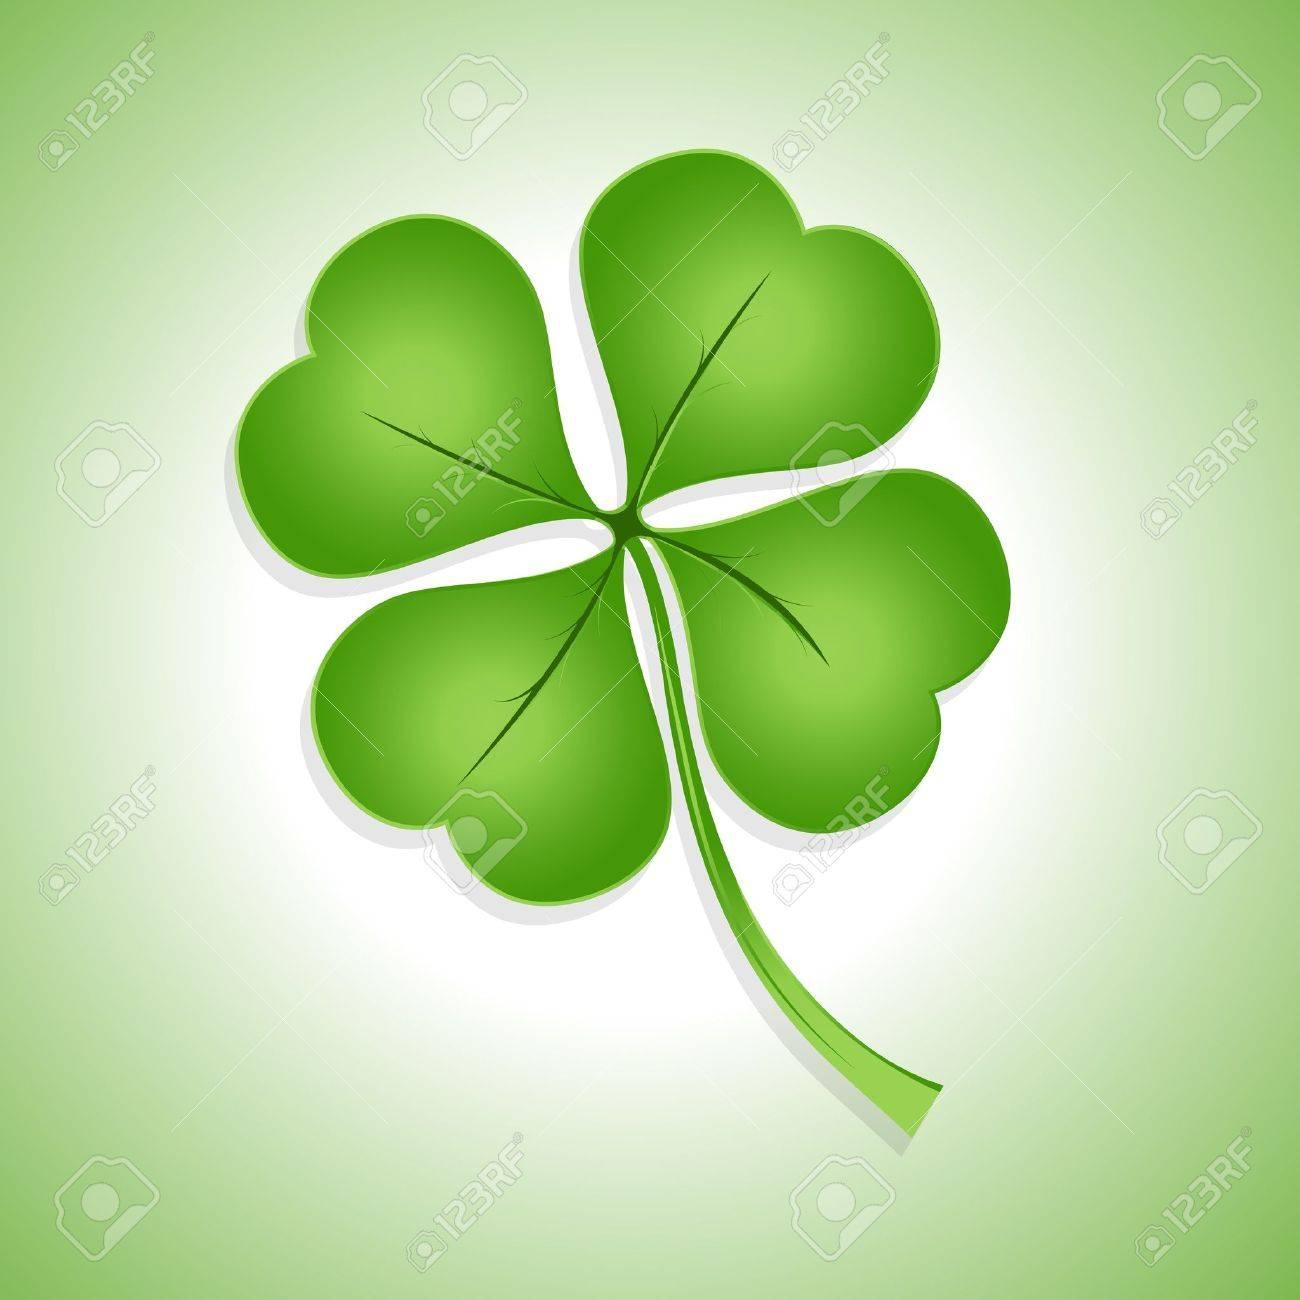 St  Patrick's Day Shamrock Stock Vector - 12654450